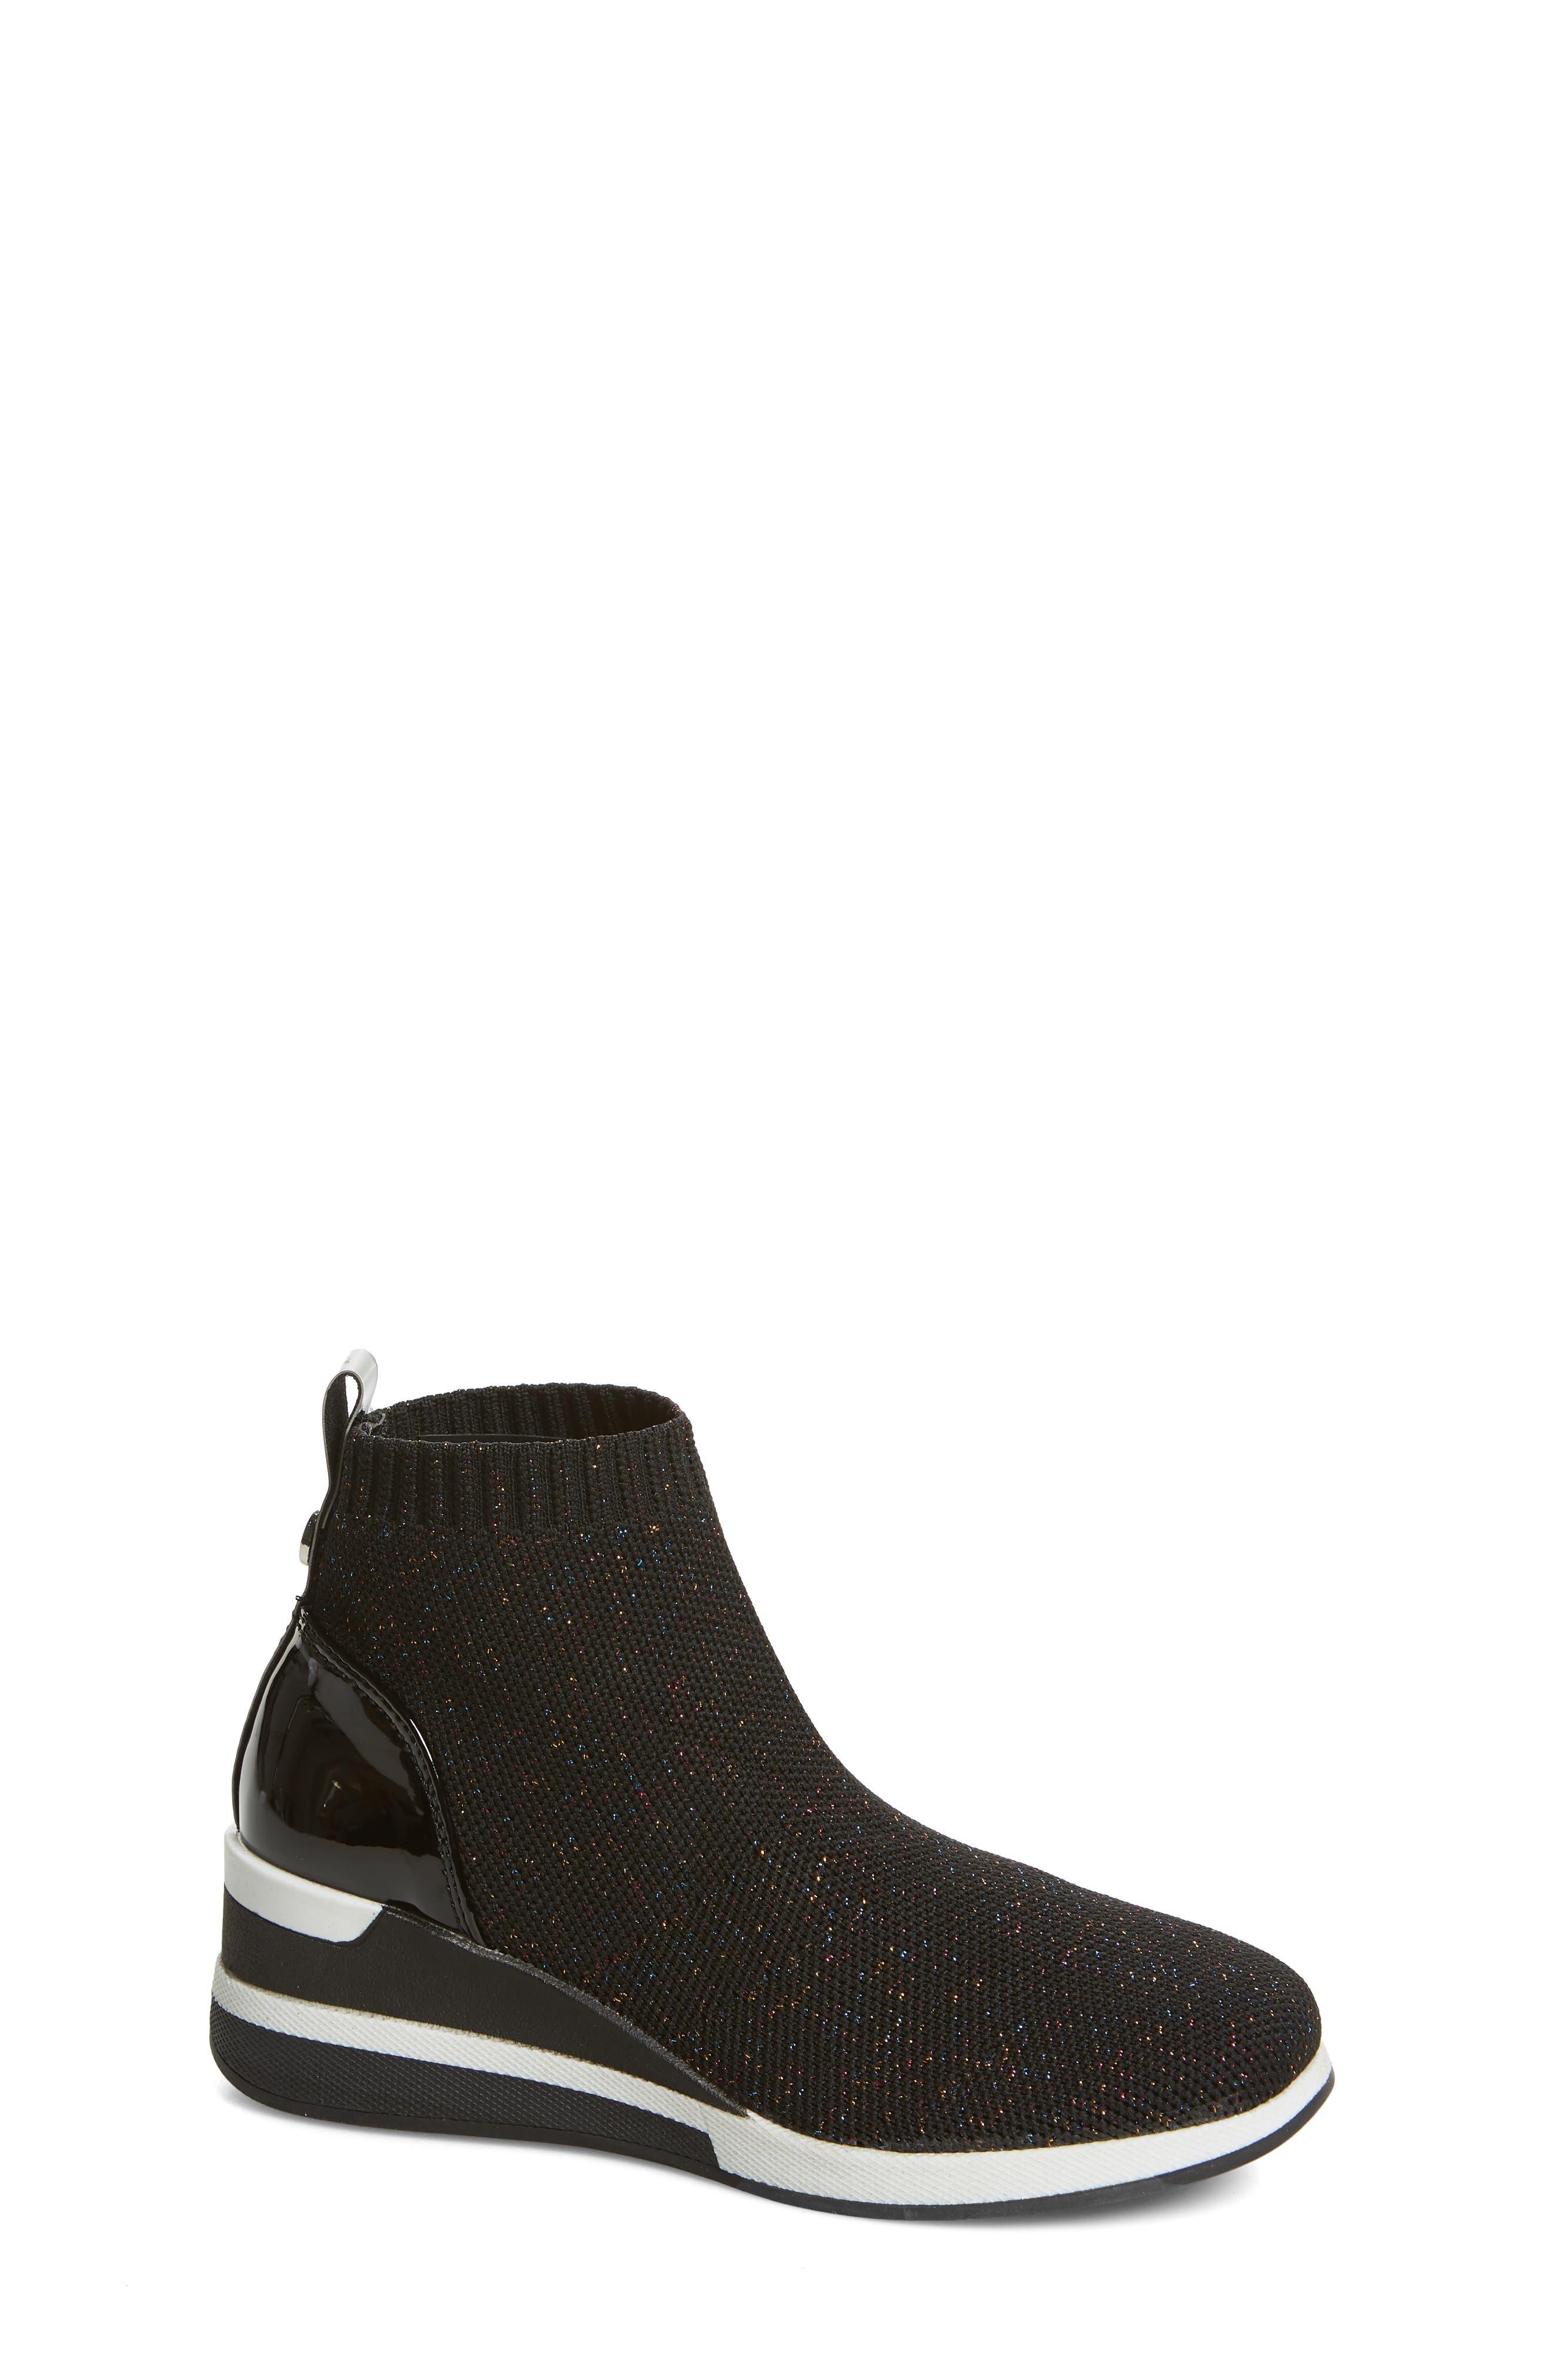 STEVE MADDEN Dusky Metallic High Top Wedge Sock Sneaker, Main, color, BLACK MULTI